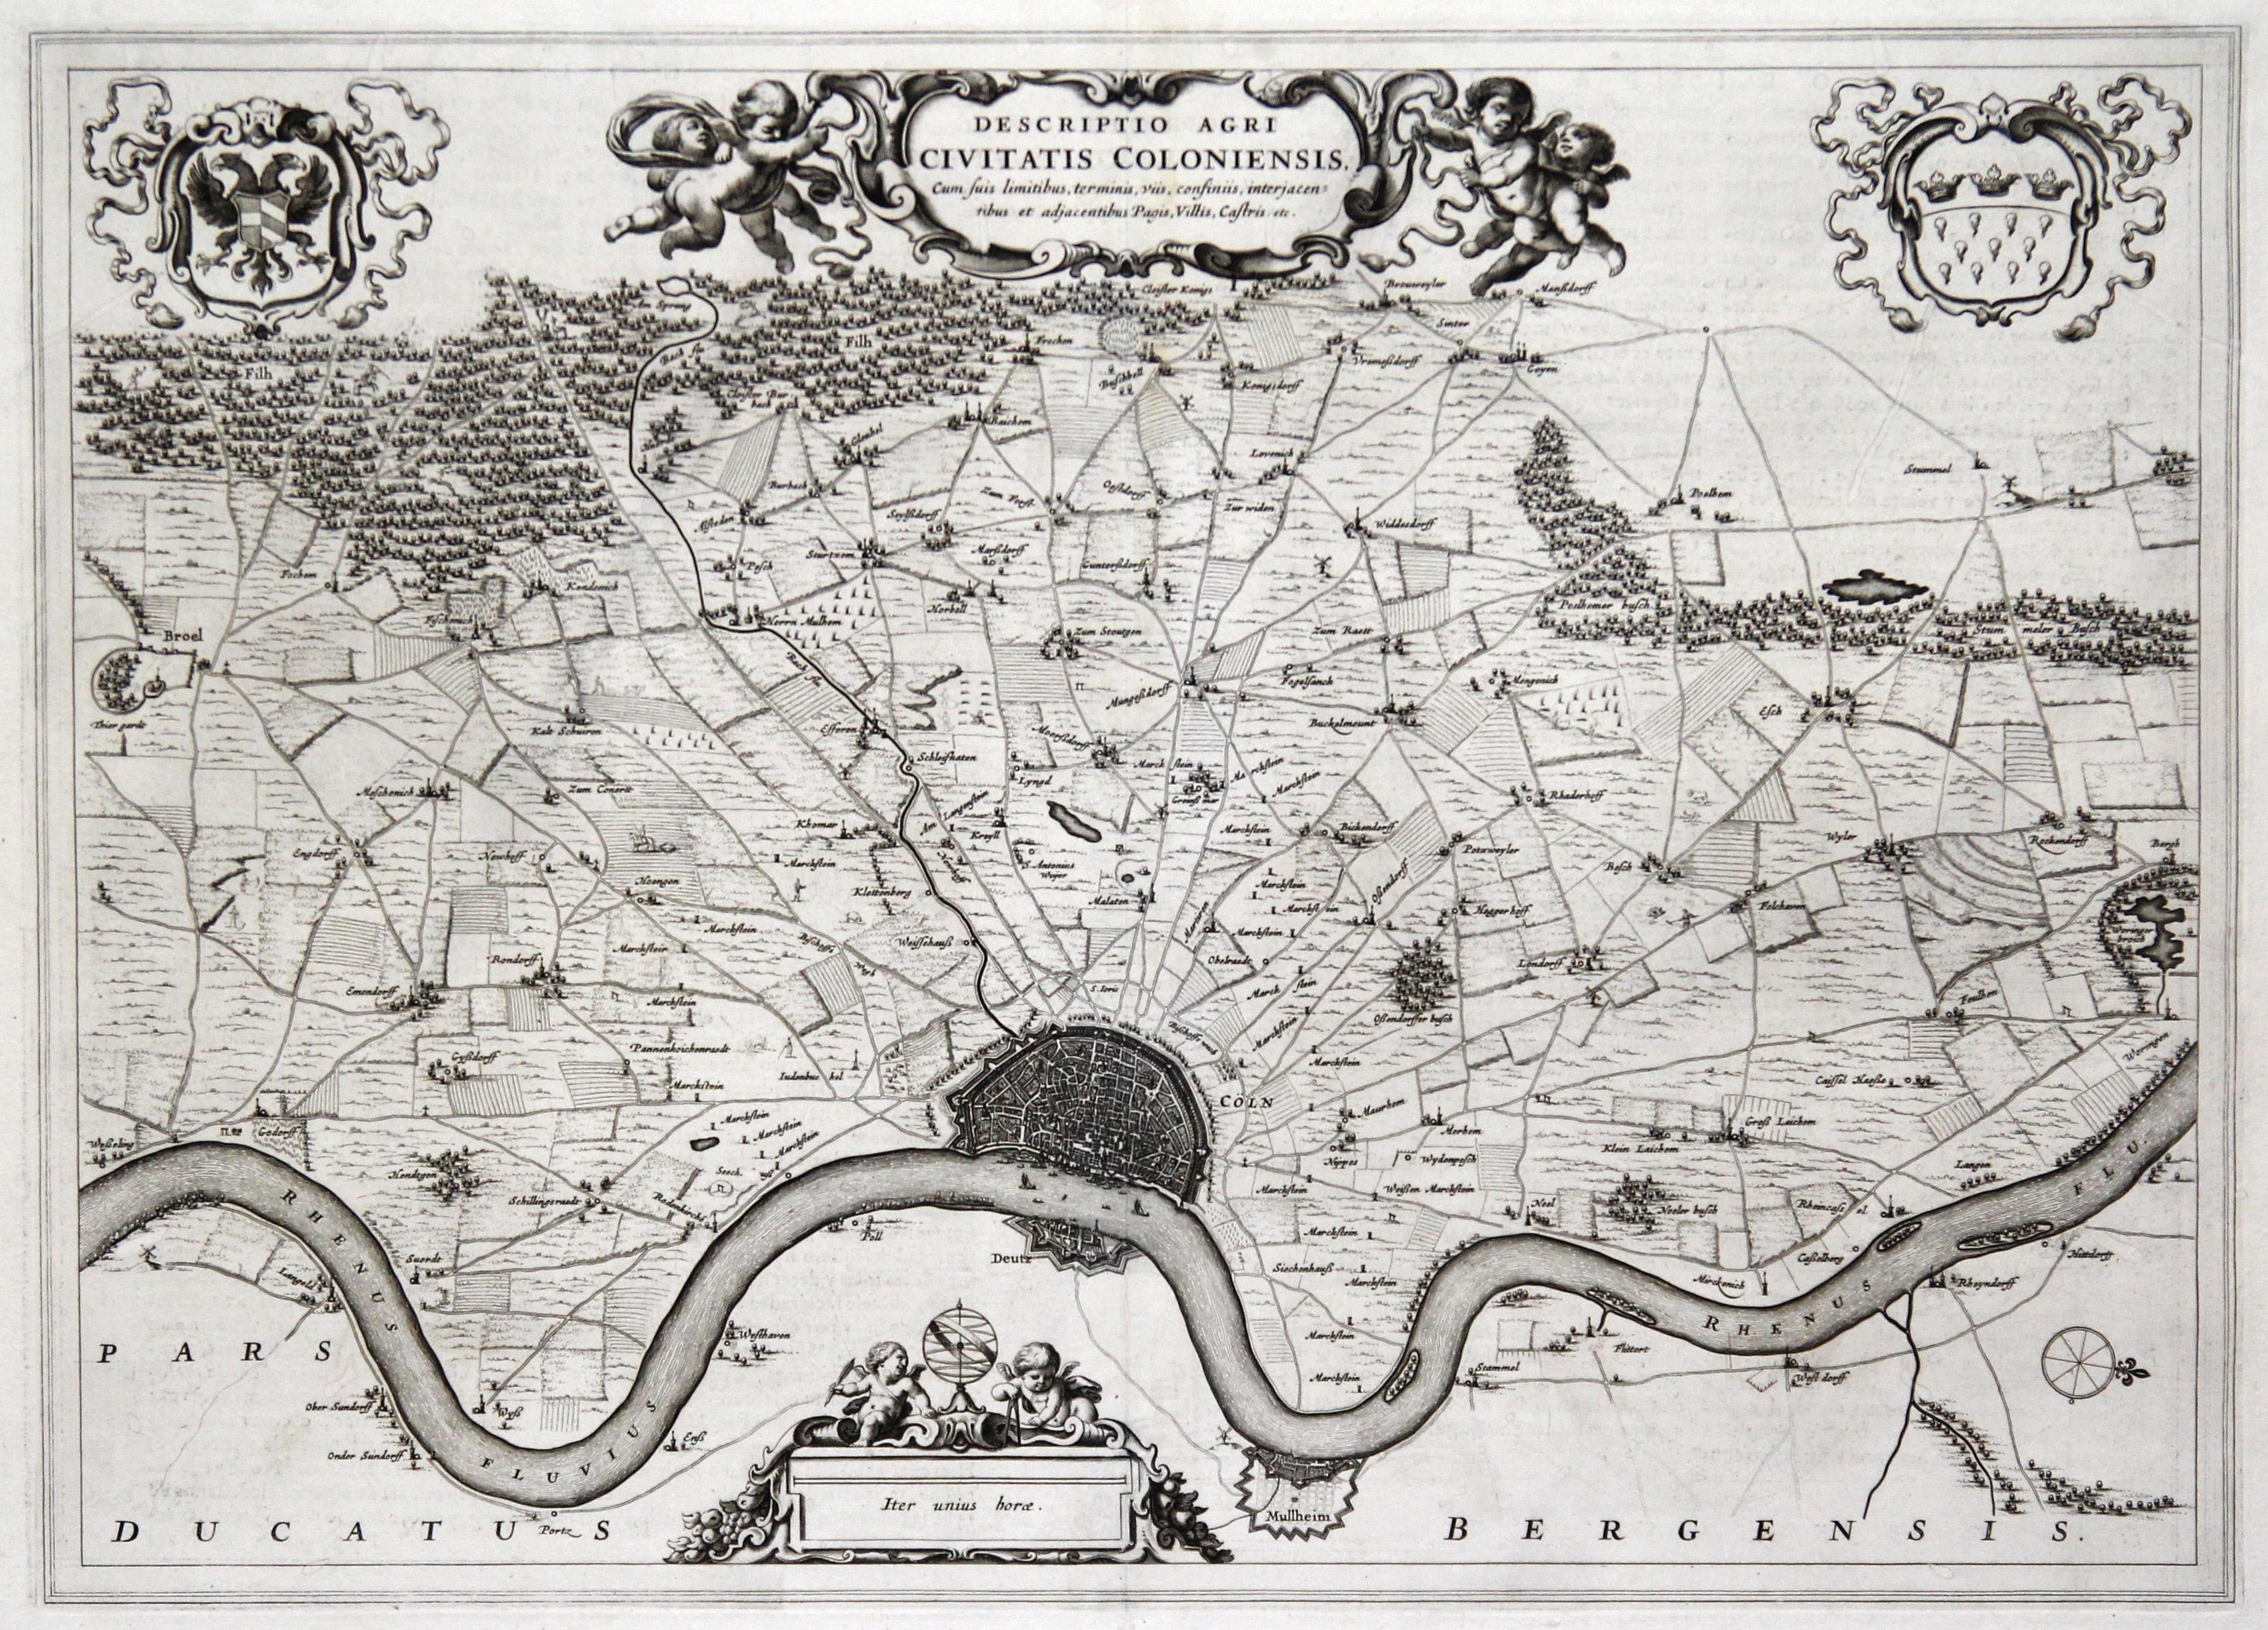 Vialibri Kst Karte Aus Dem Atlas Major Bei Blaeu Descriptio